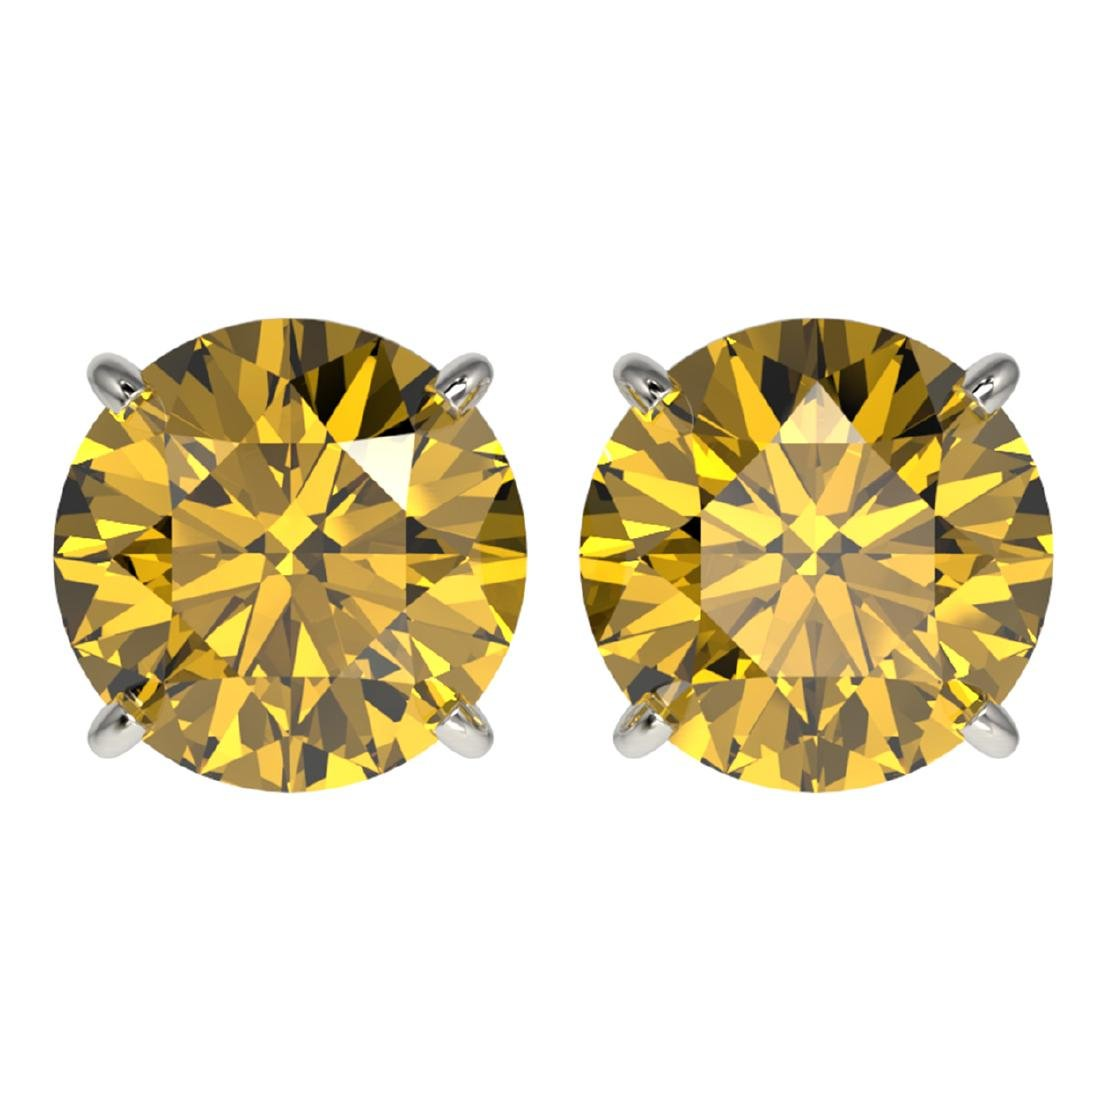 4 ctw Intense Yellow Diamond Stud Earrings 10K White